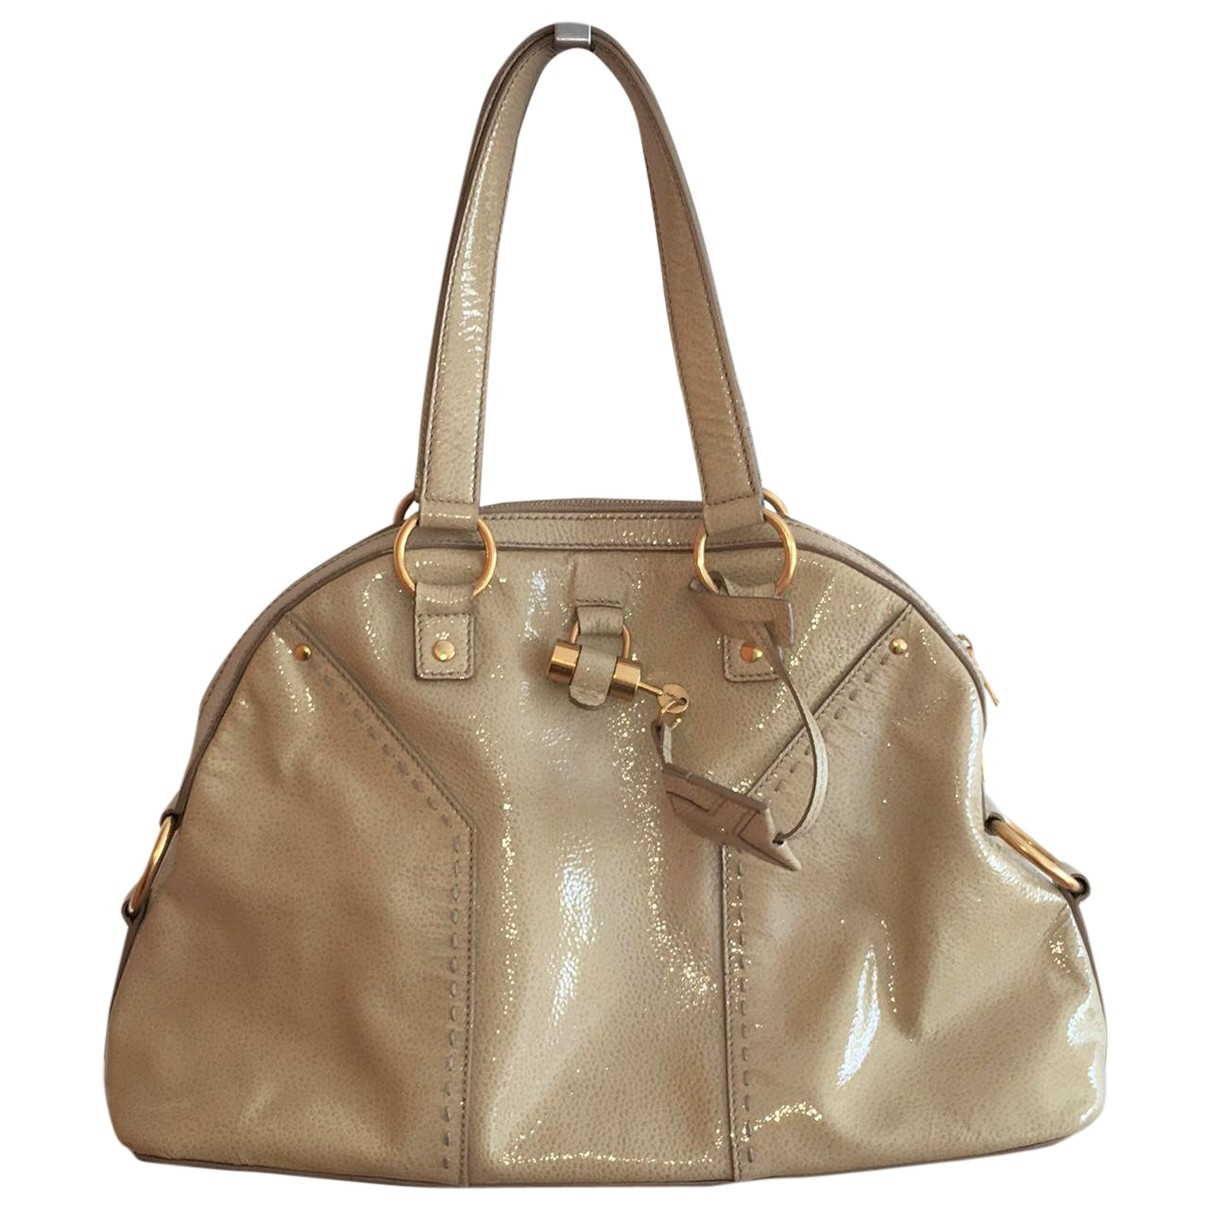 Yves Saint Laurent Muse Beige Patent leather handbag for Women \N